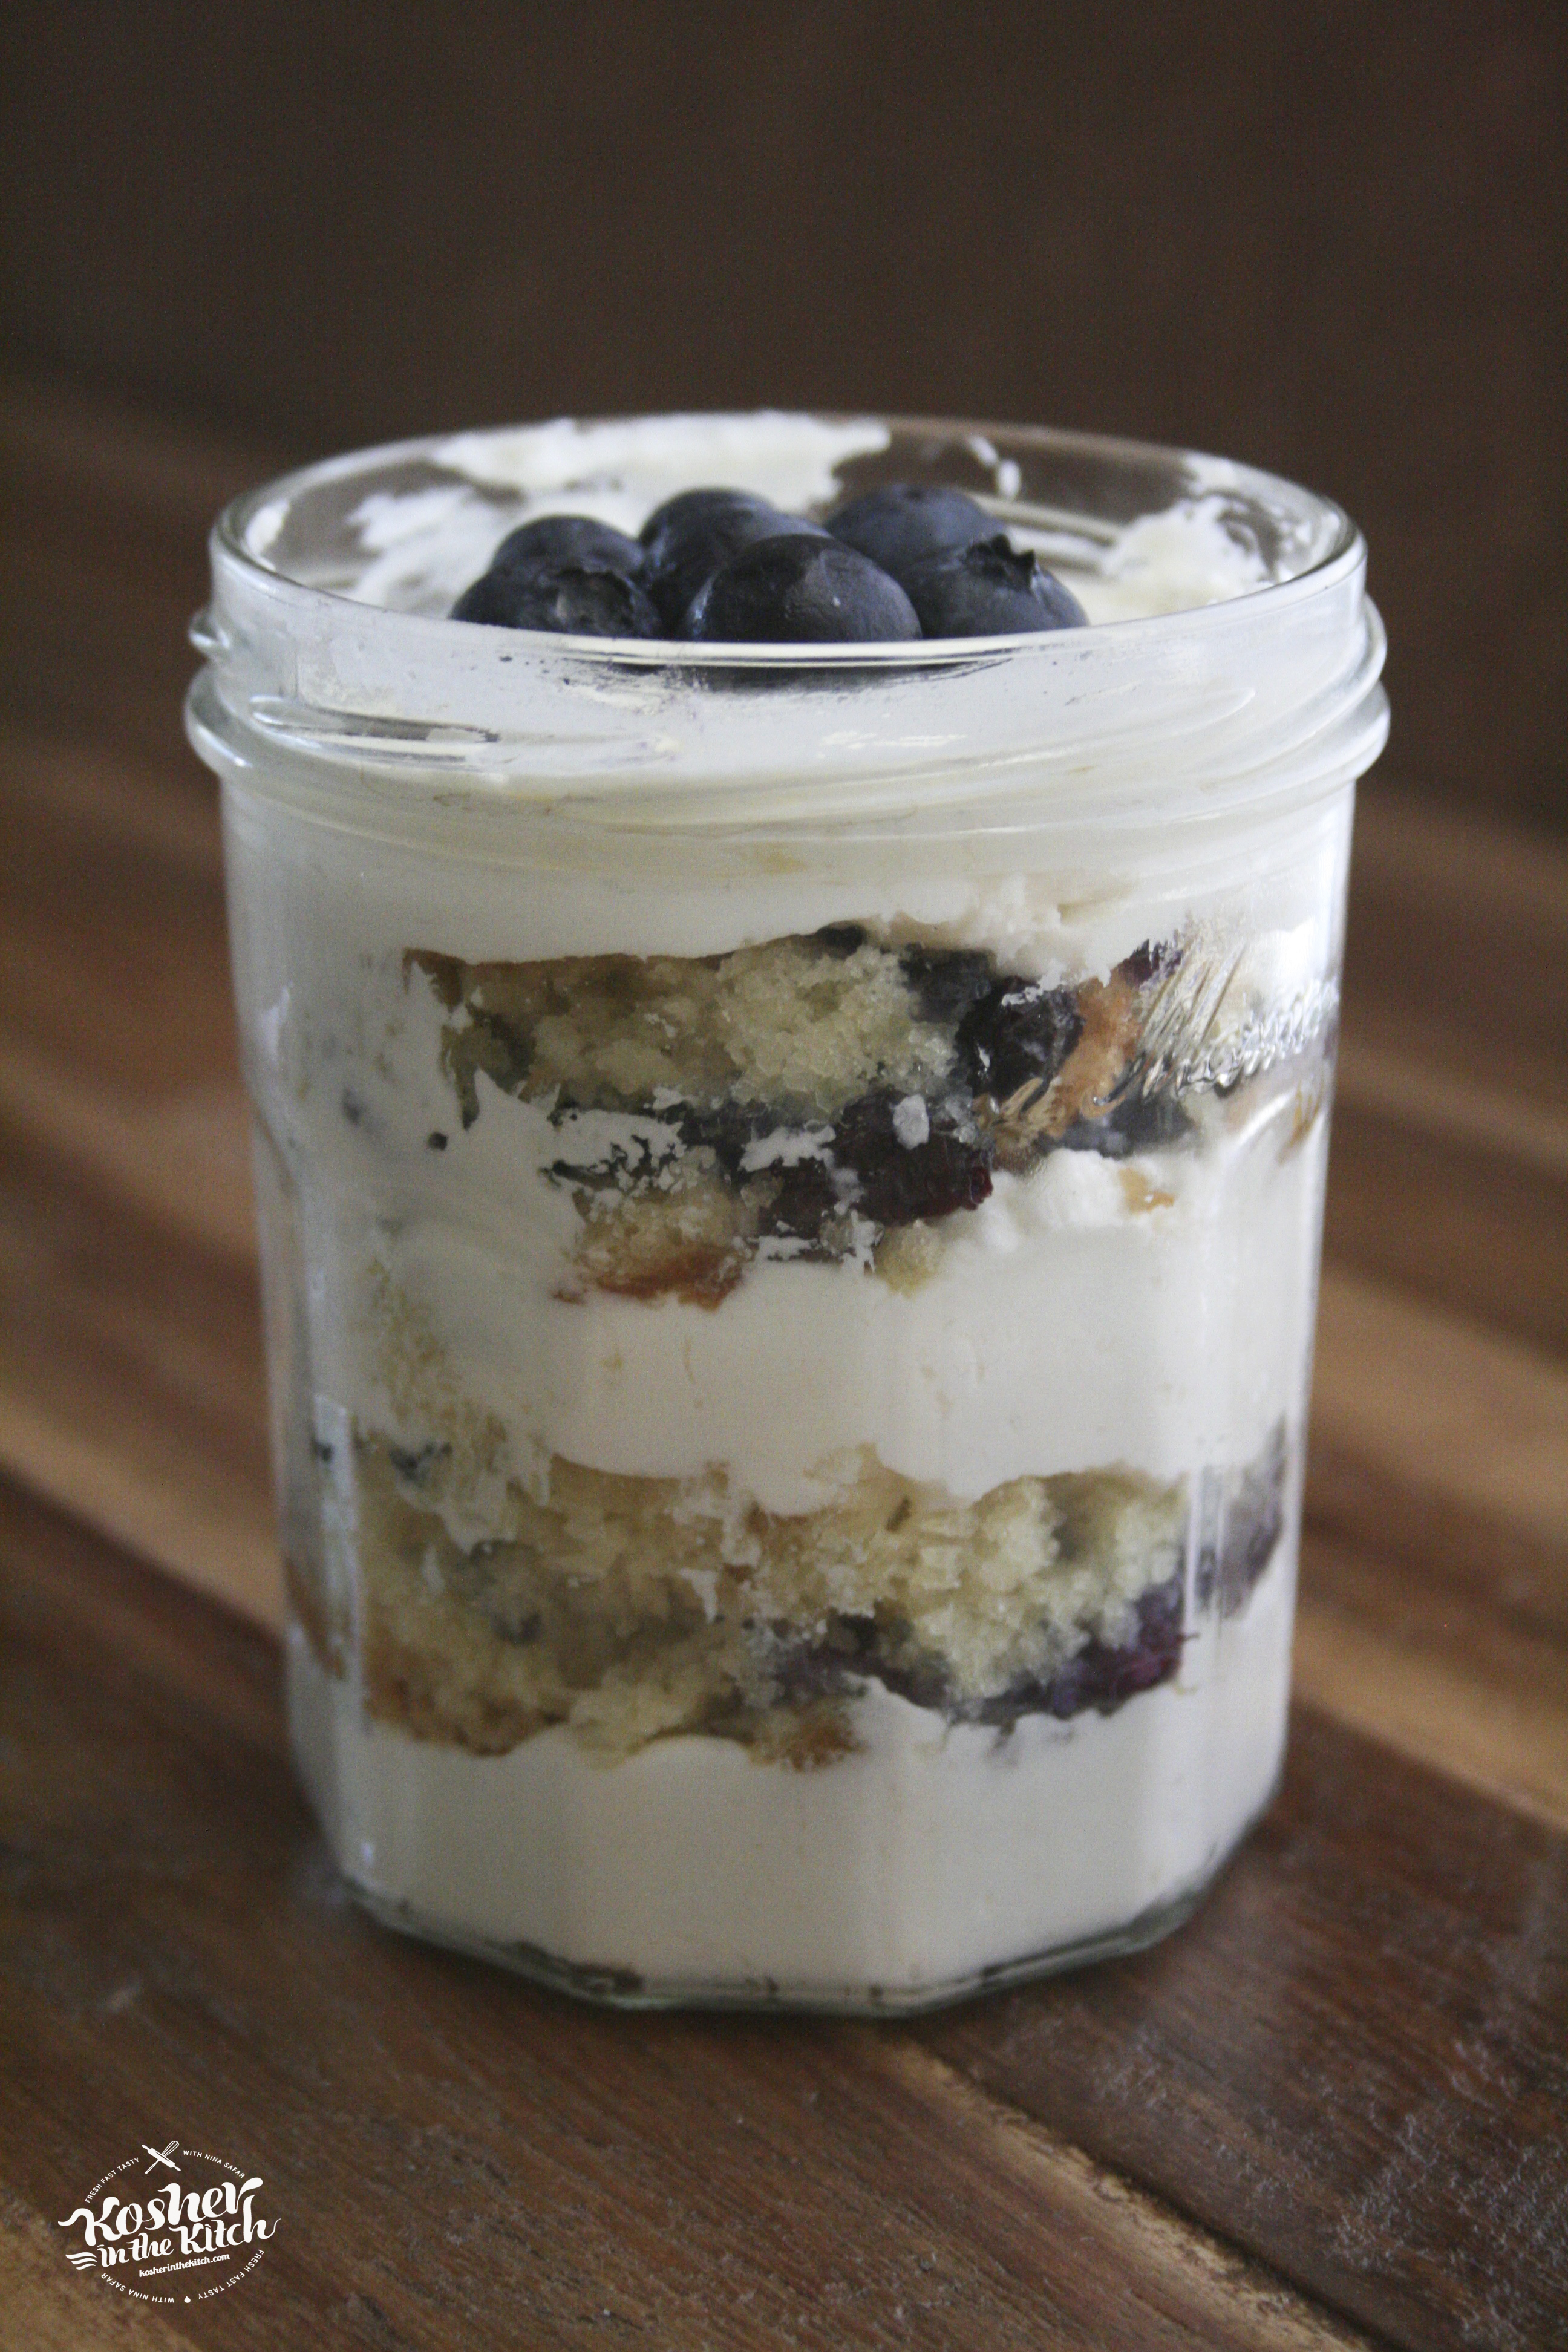 Lemon Blueberry Cake in a Jar